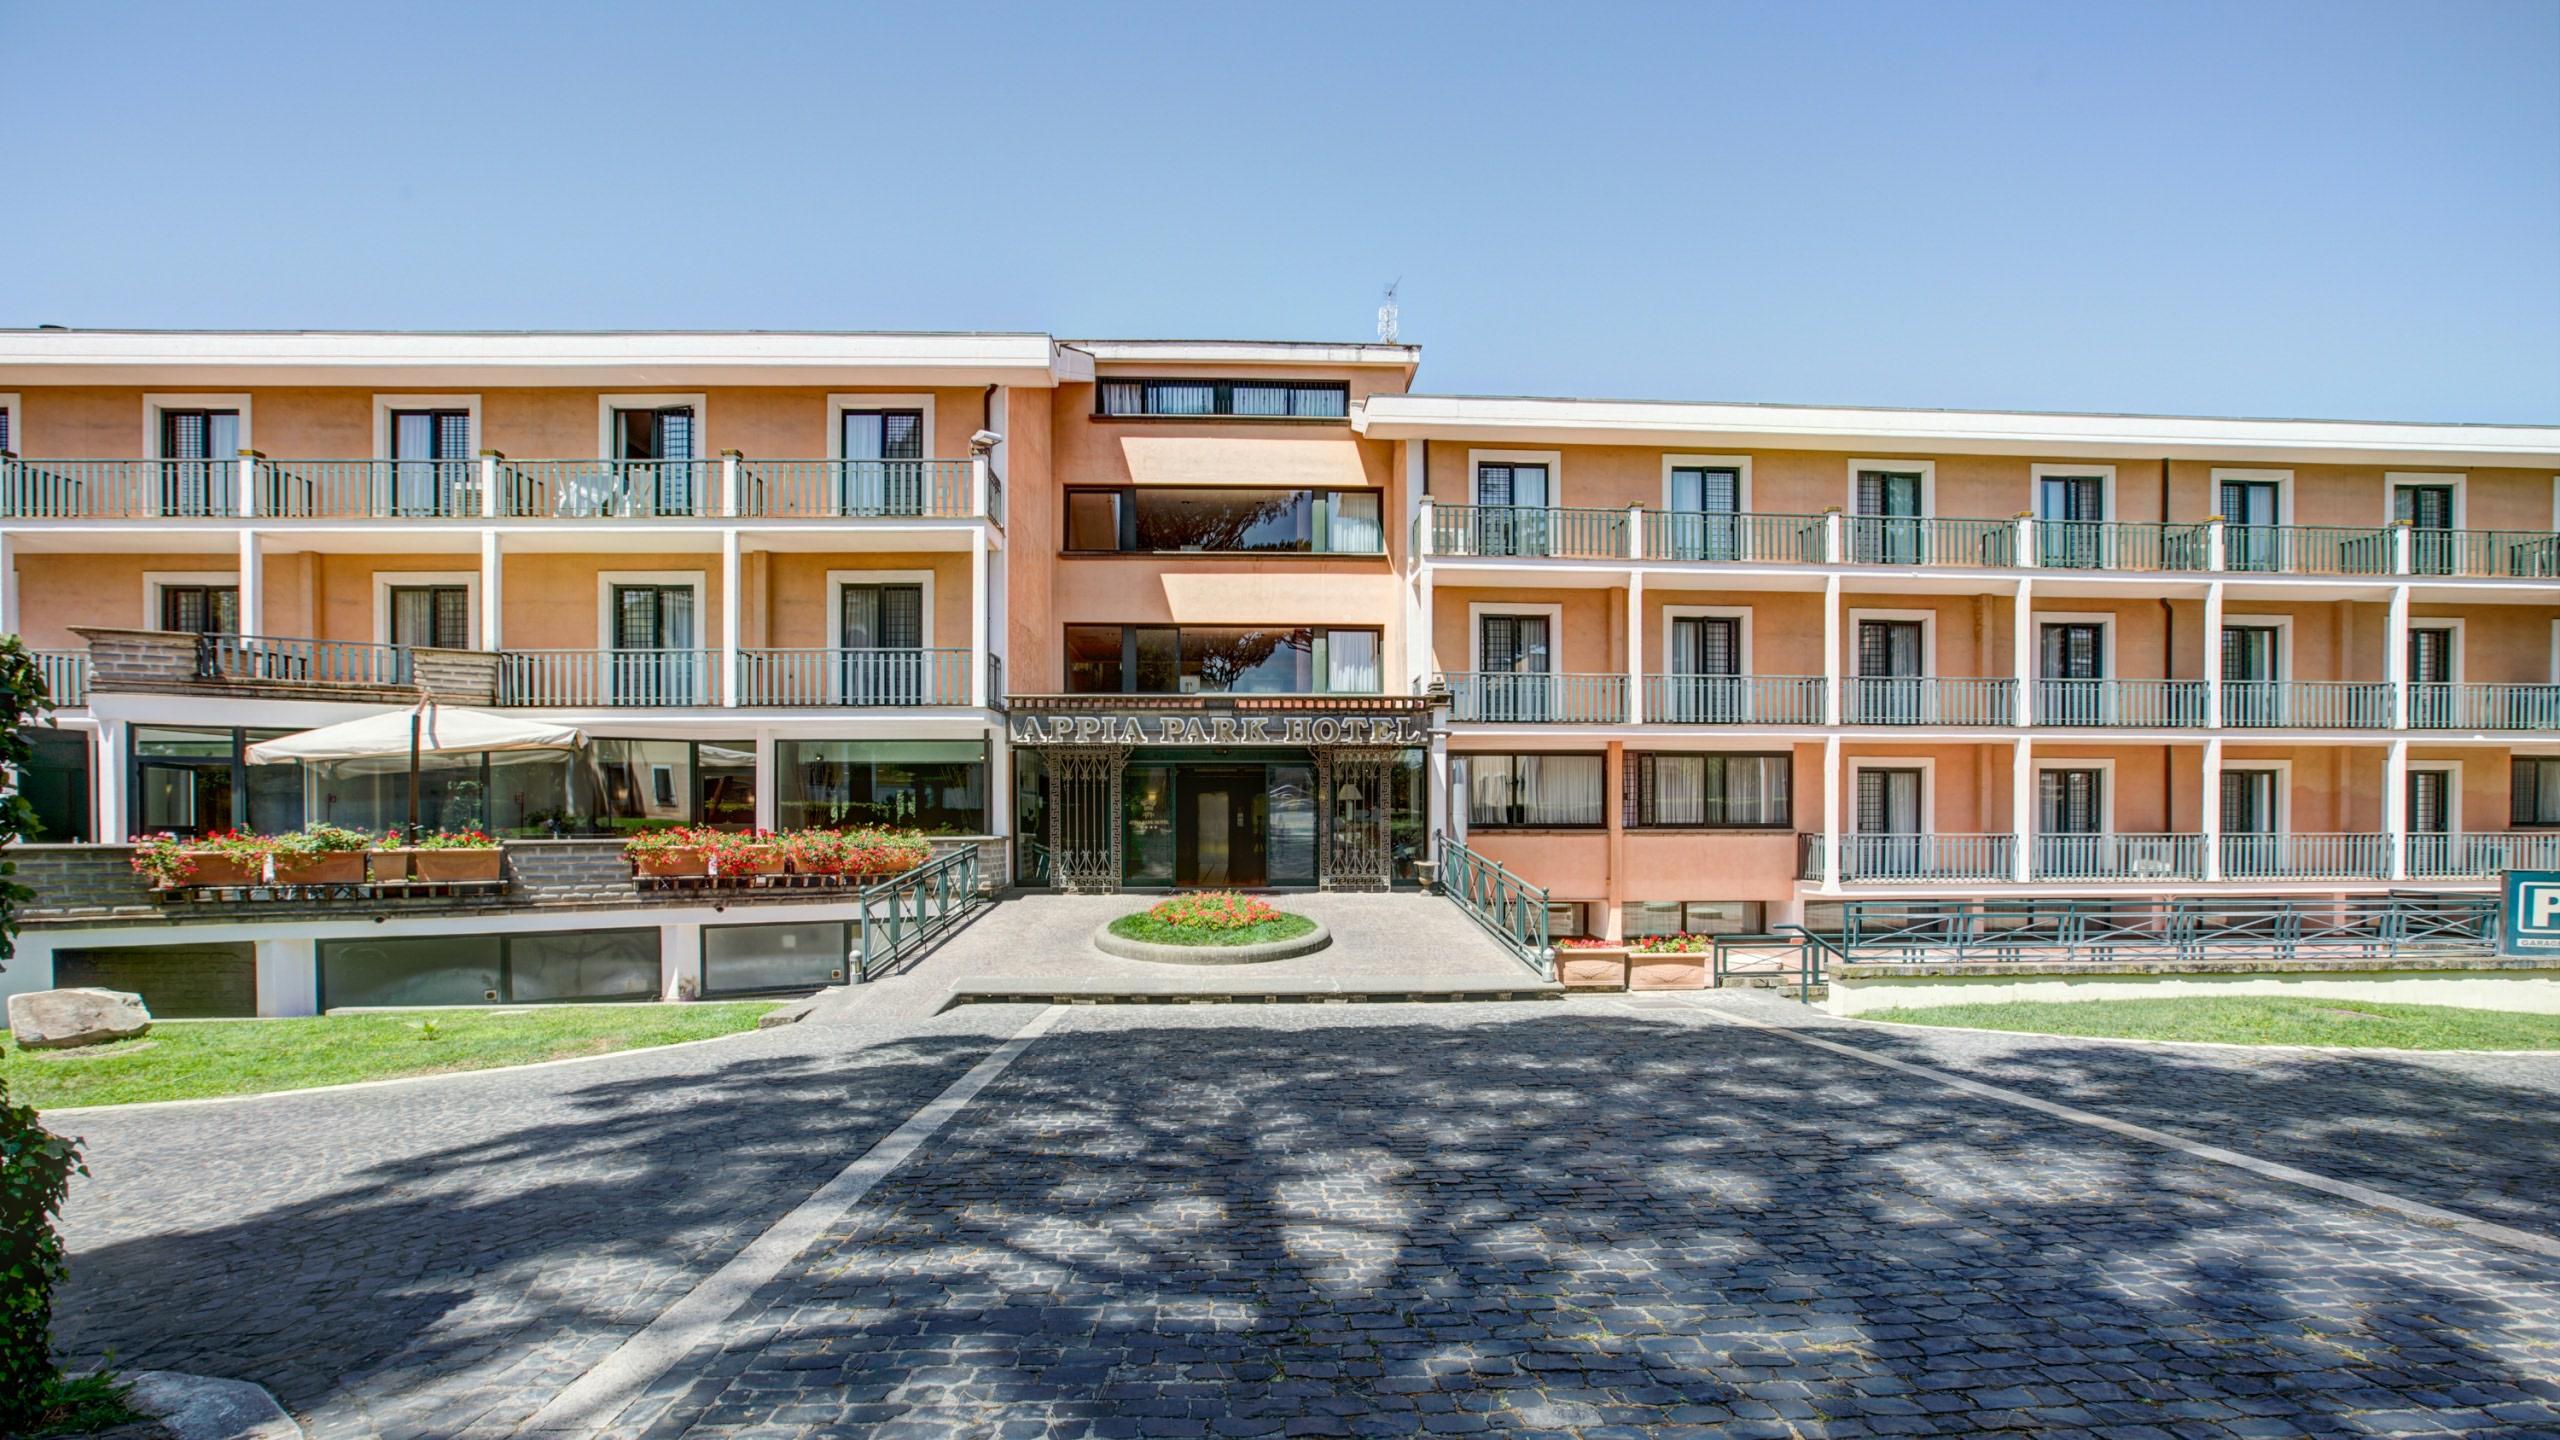 appia-park-hotel-roma-externo-01